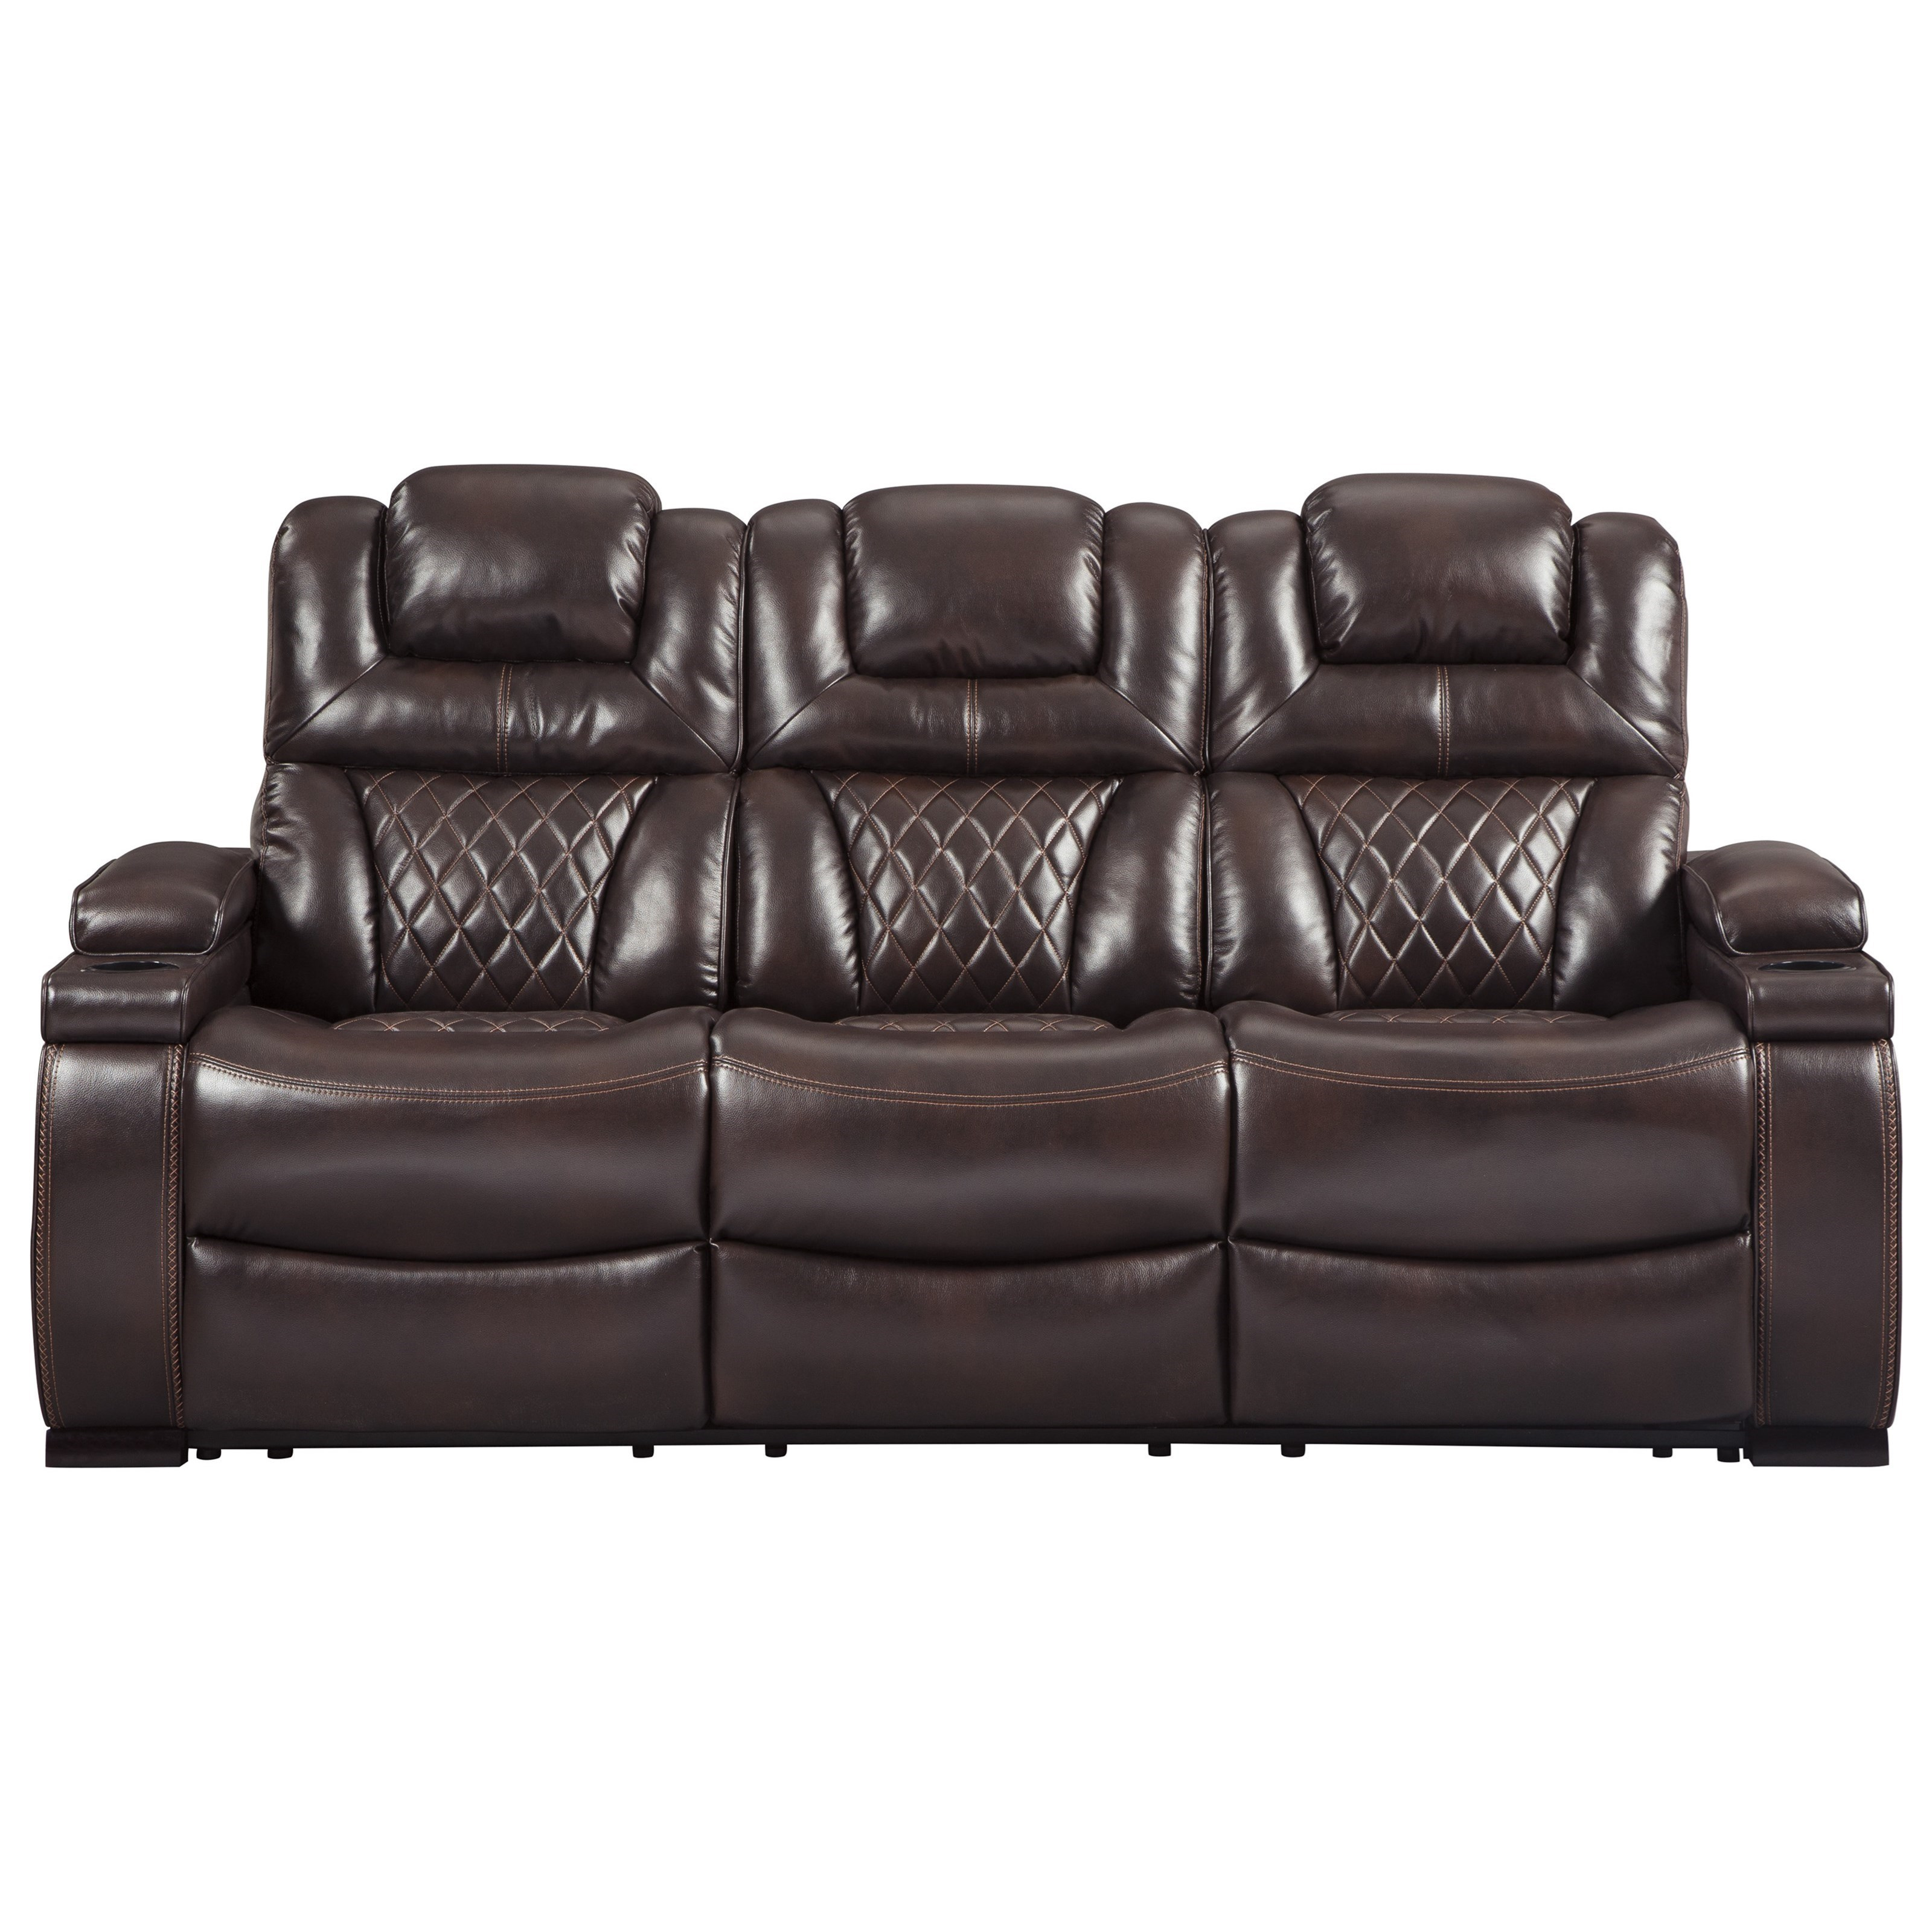 ashley signature design warnerton 7540715 power reclining sofa with rh dunkandbright com sectional sofa power recliner power sofa recliner mechanism